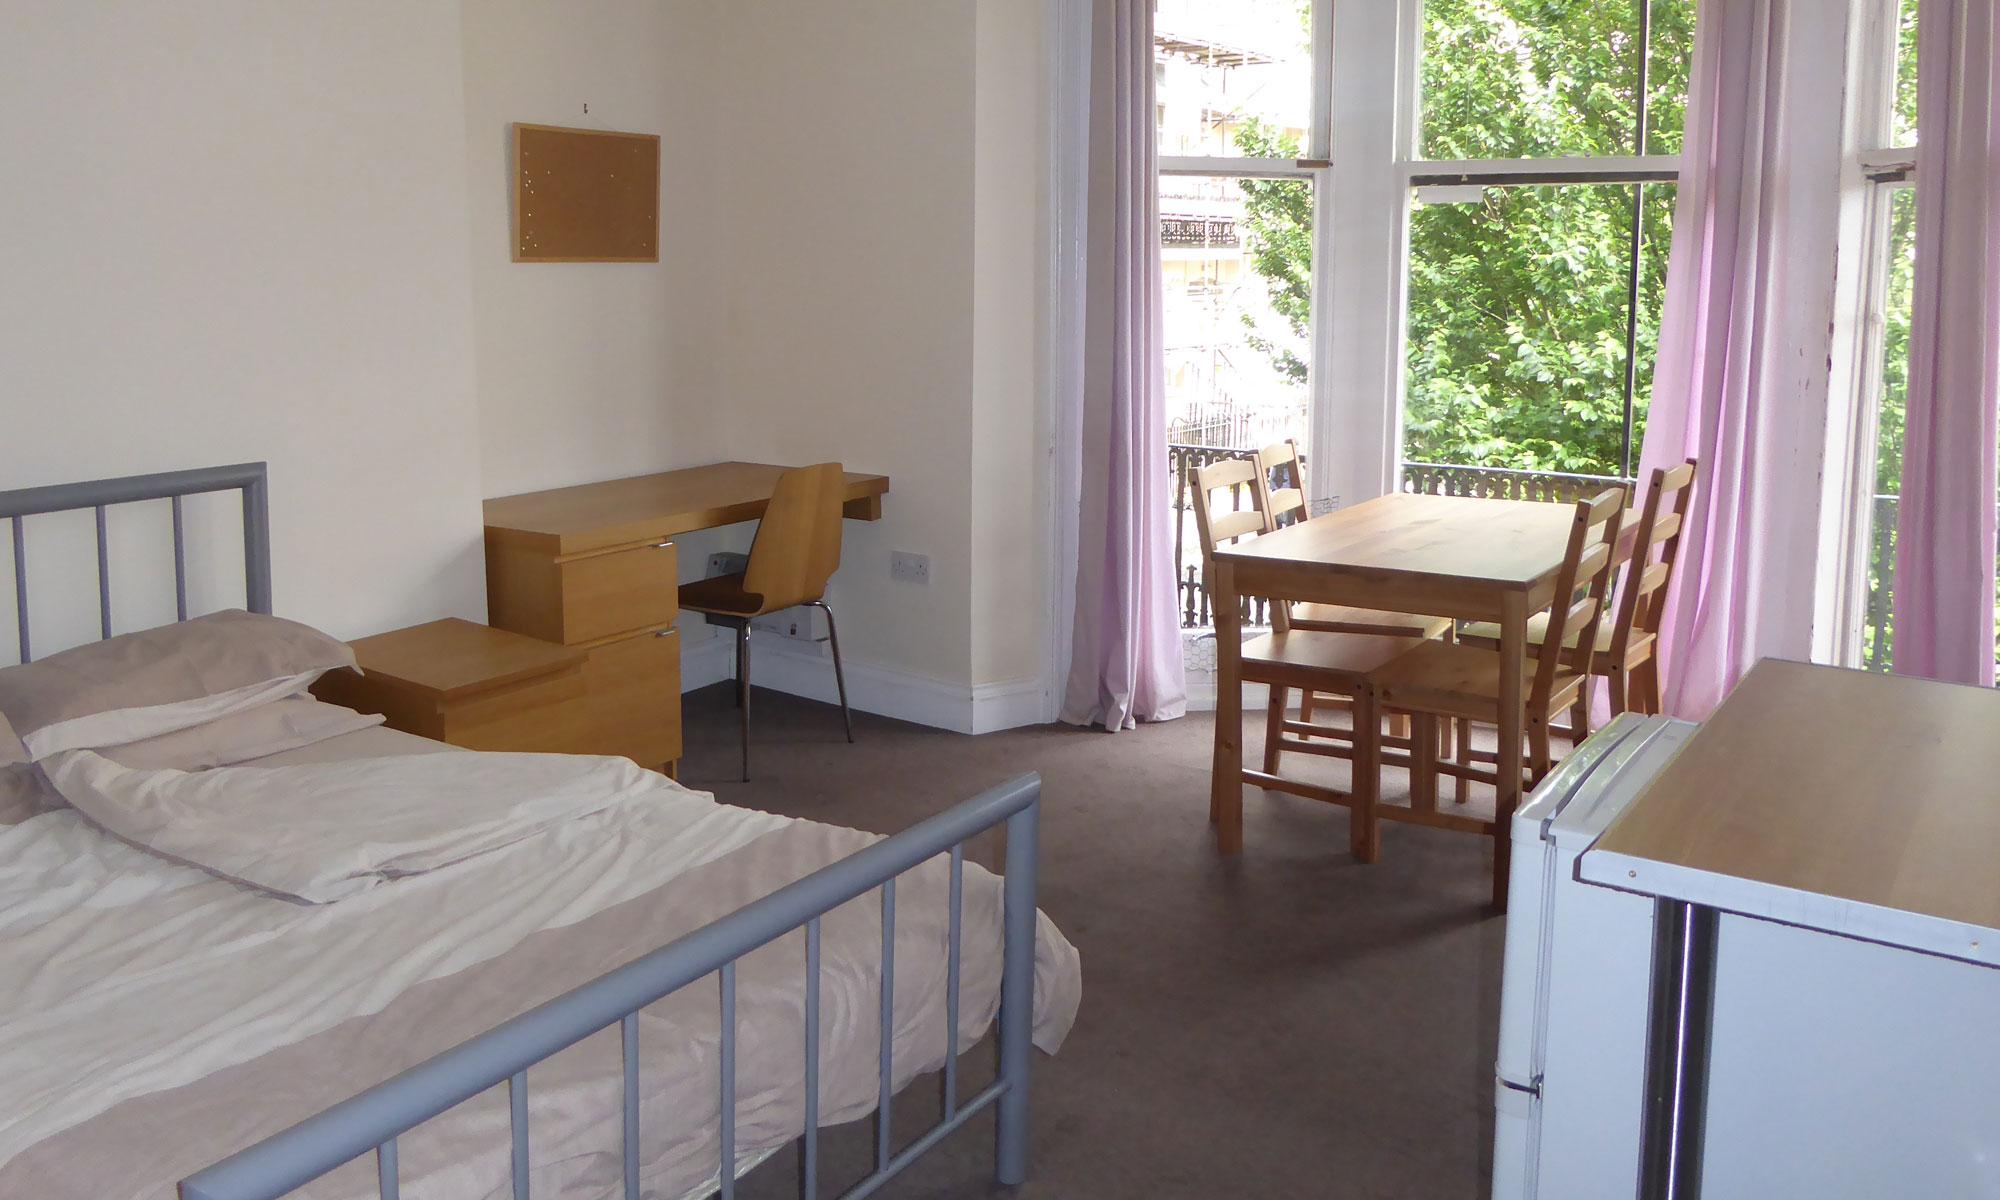 Bedford-square-bedroom-1